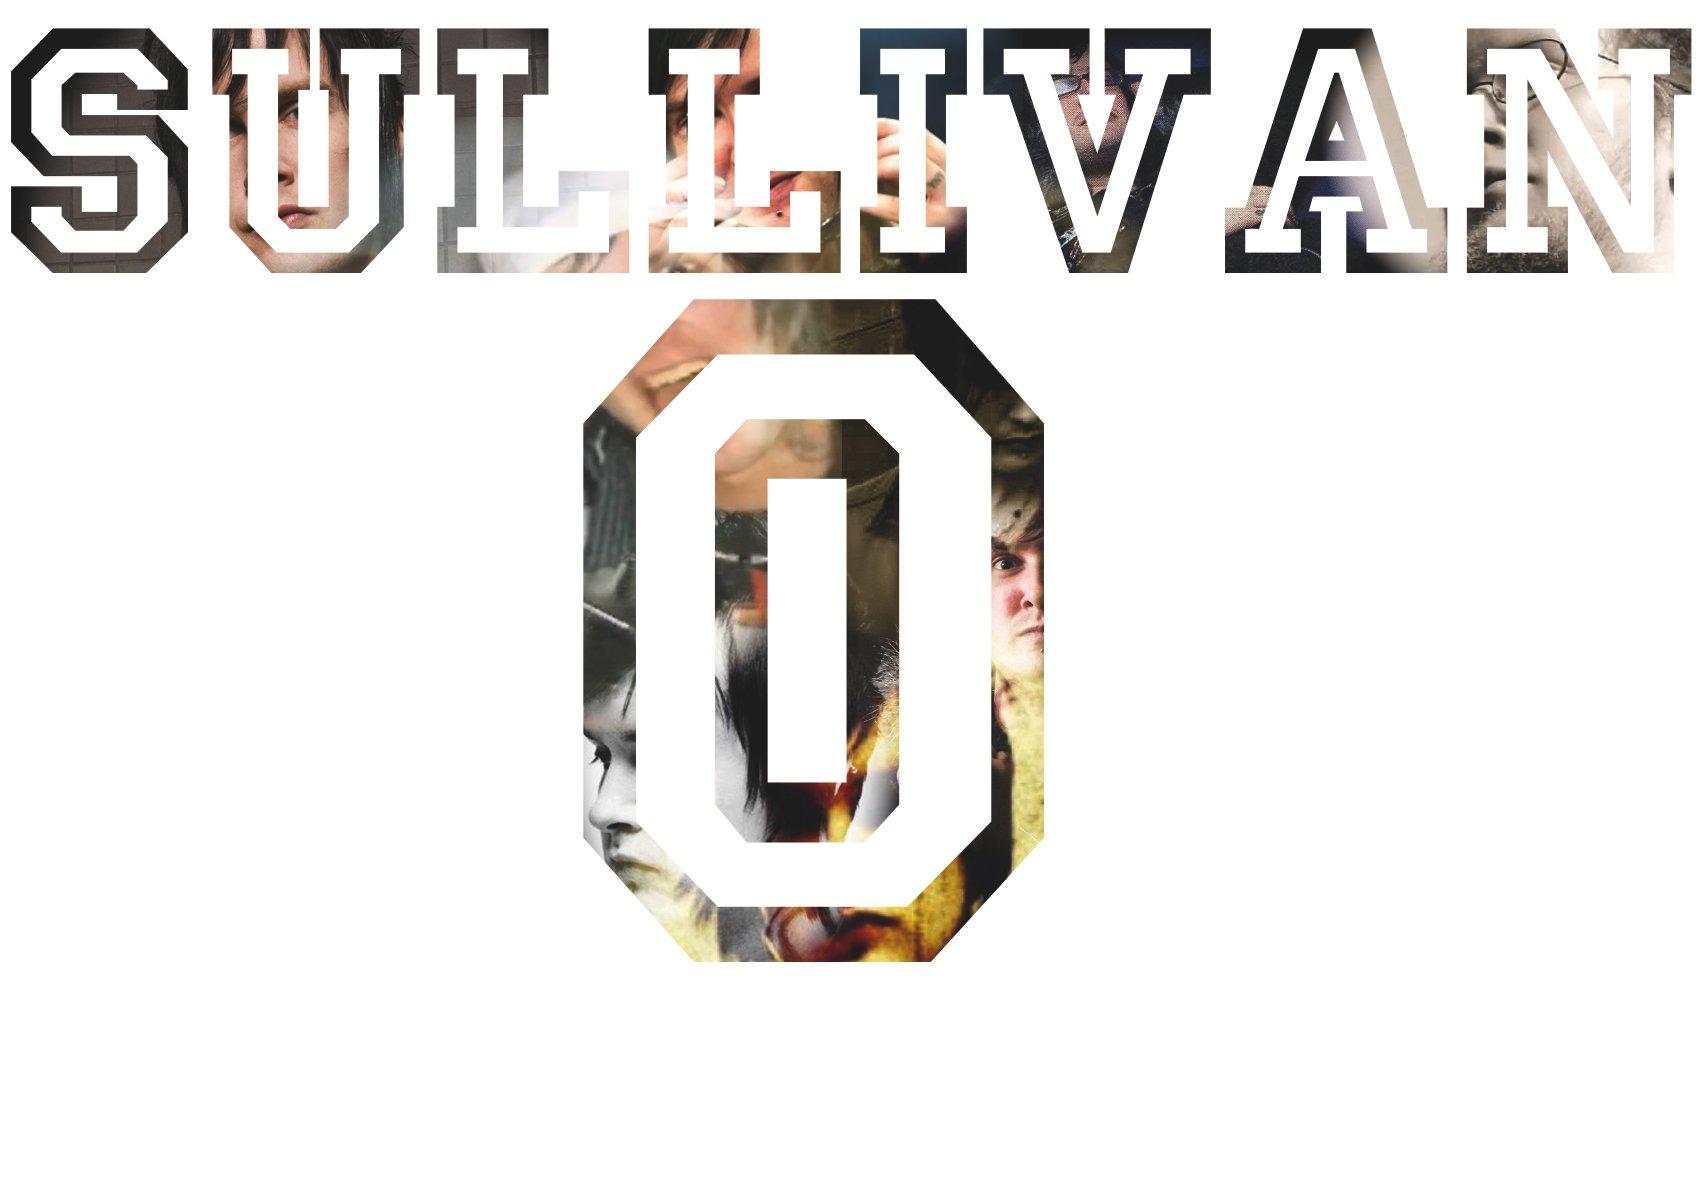 Sullivan wallpaper by jimmyakaemily2578 1700x1200